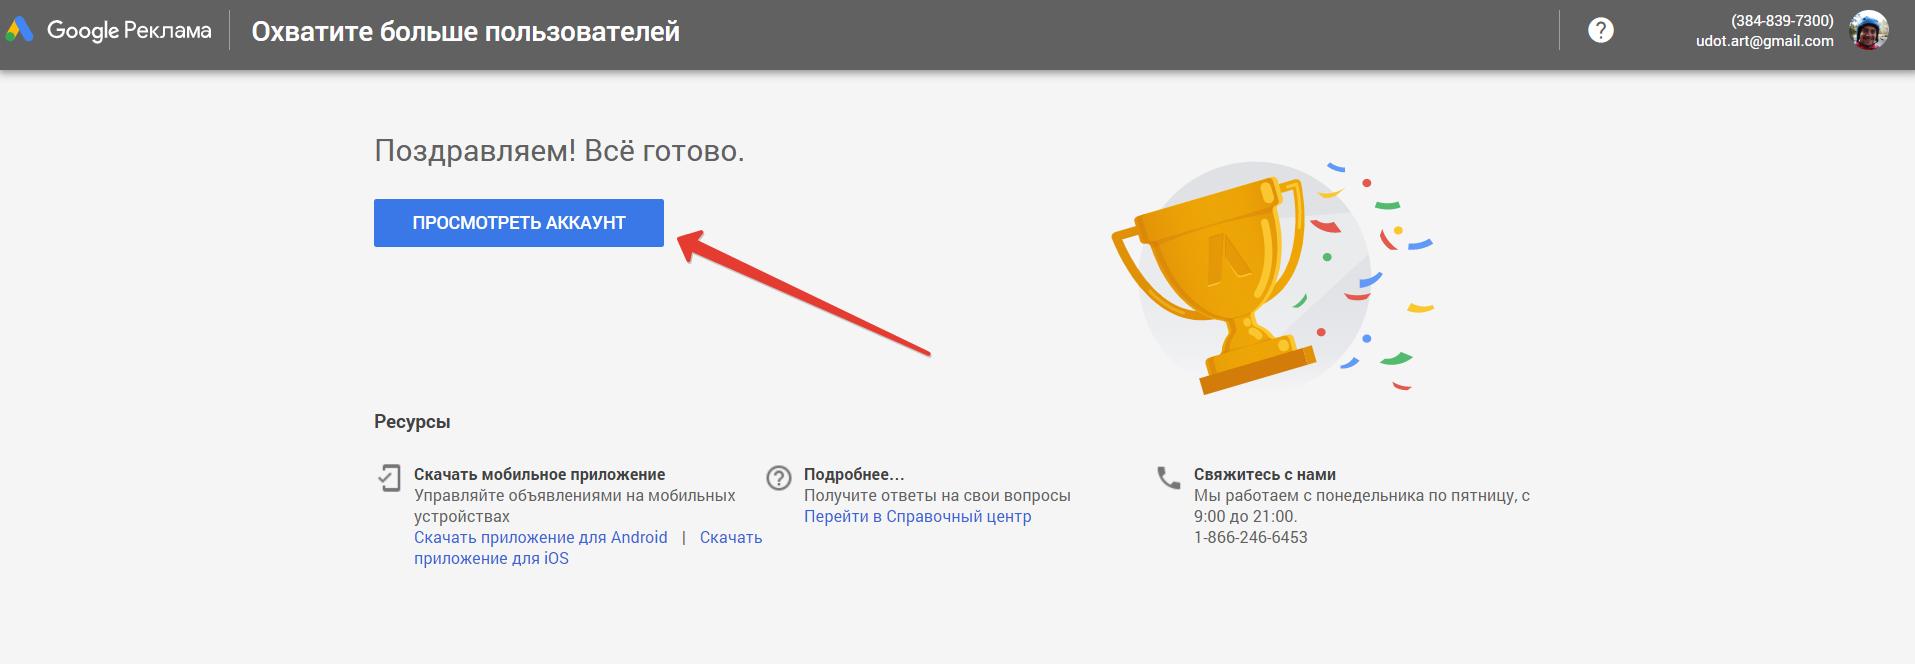 Google Keyword Planner финал